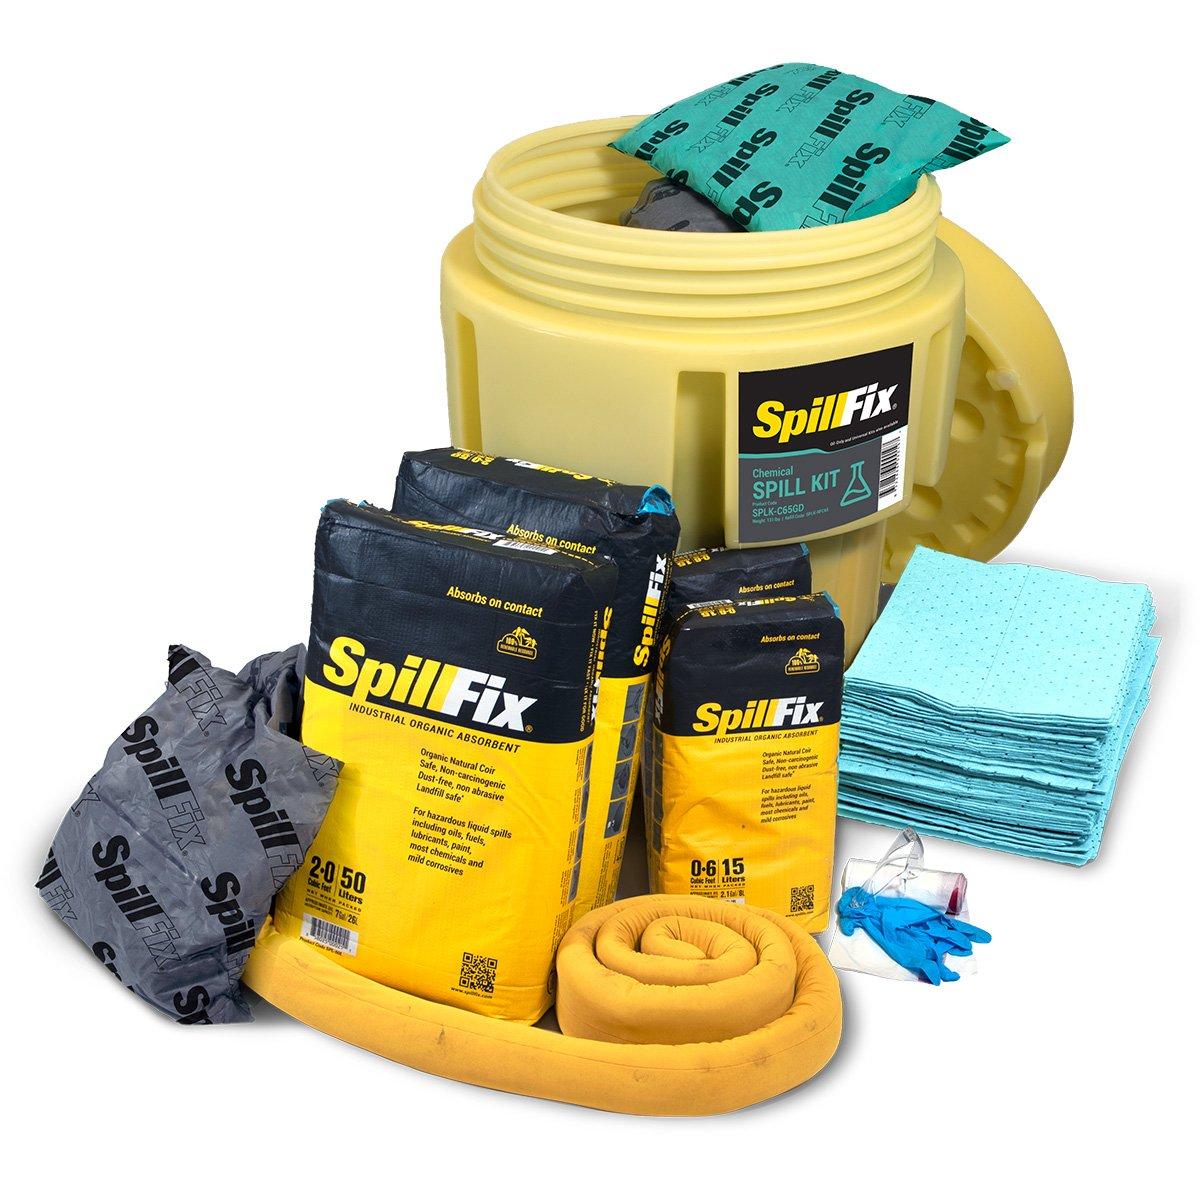 SpillFix HazMat Spill Kit in 65 Gallon Overpack Salvage Drum